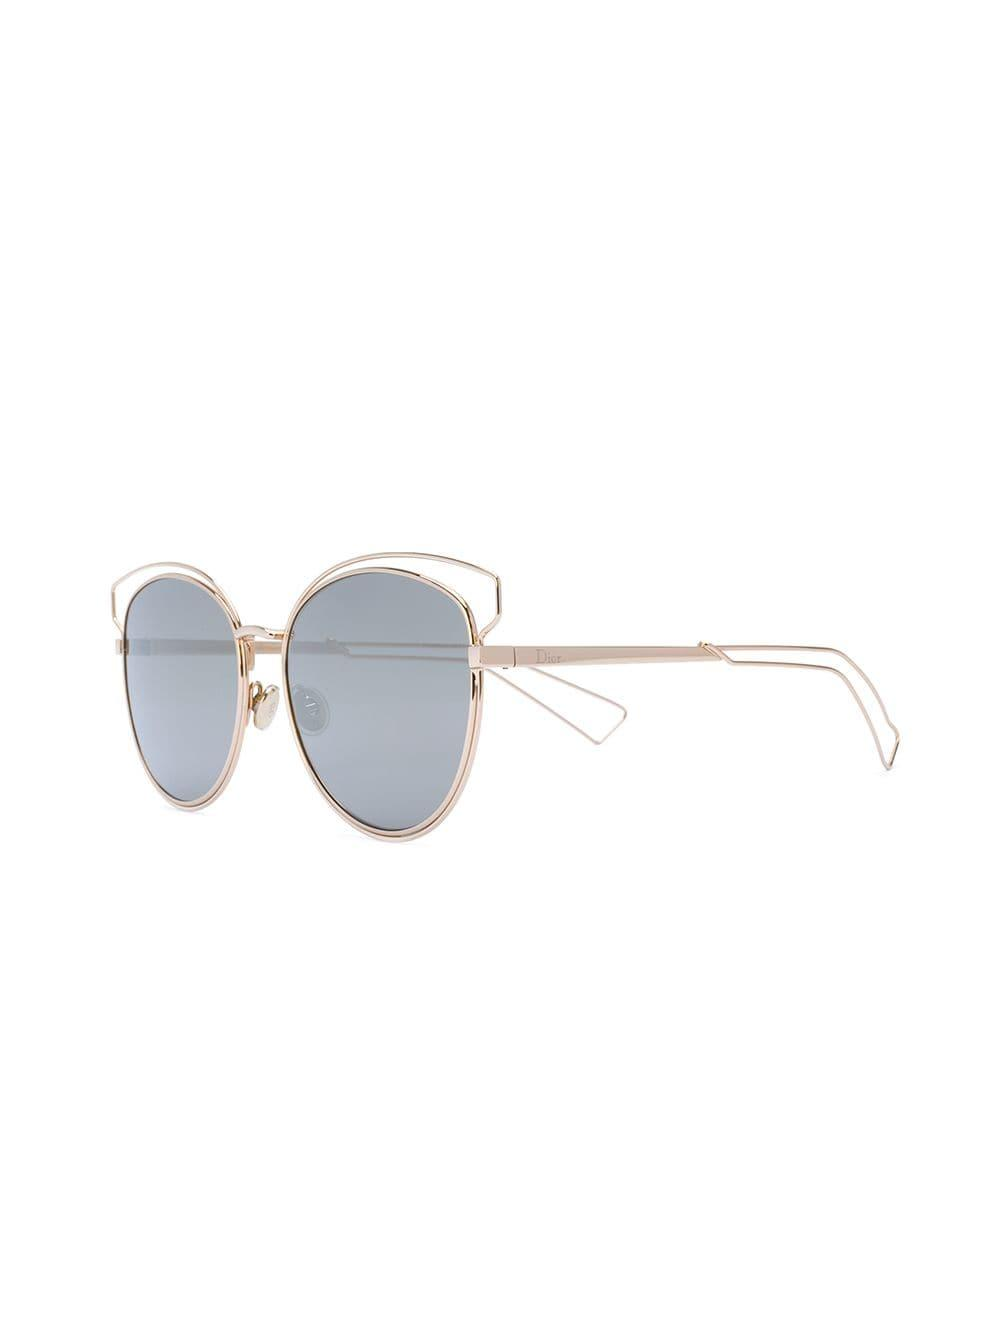 a28ede3fd3 Lyst - Dior Sideral 2 Sunglasses in Metallic